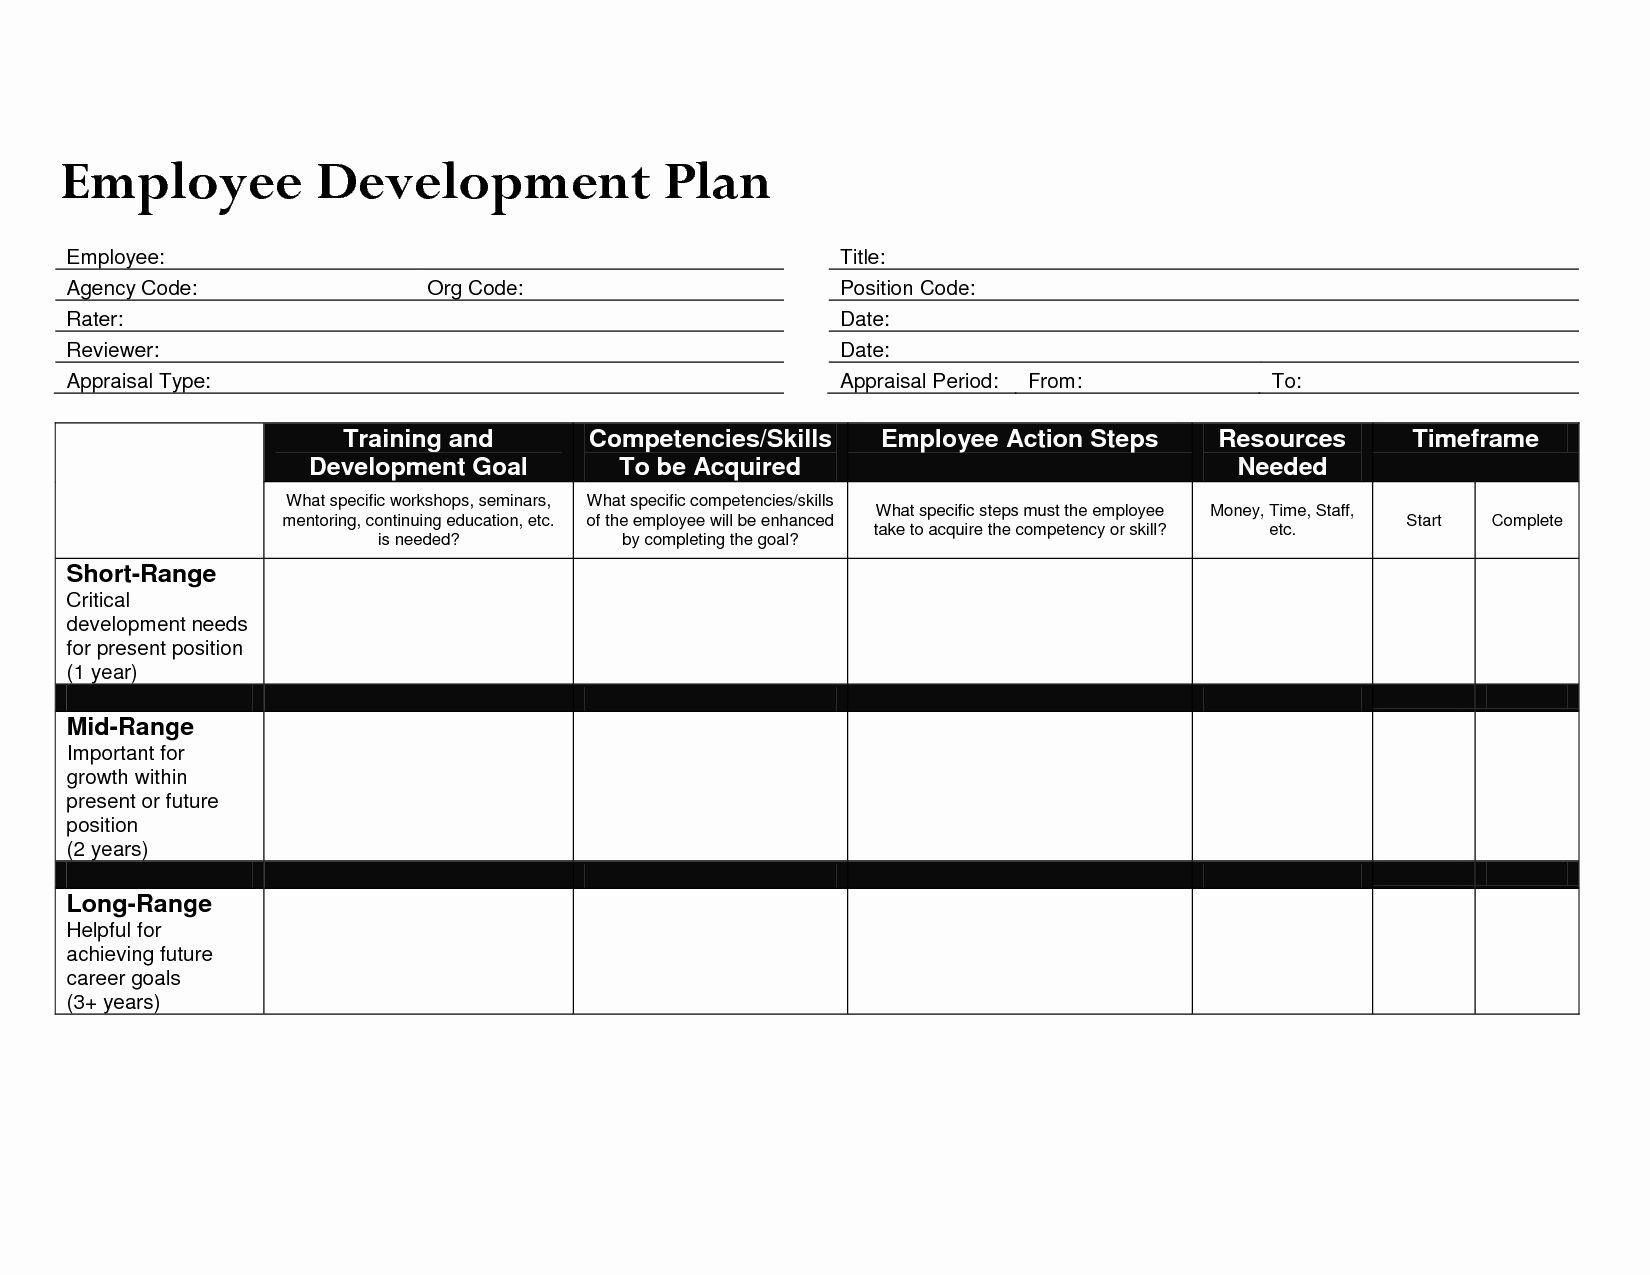 Employee Development Plans Templates Awesome Employee